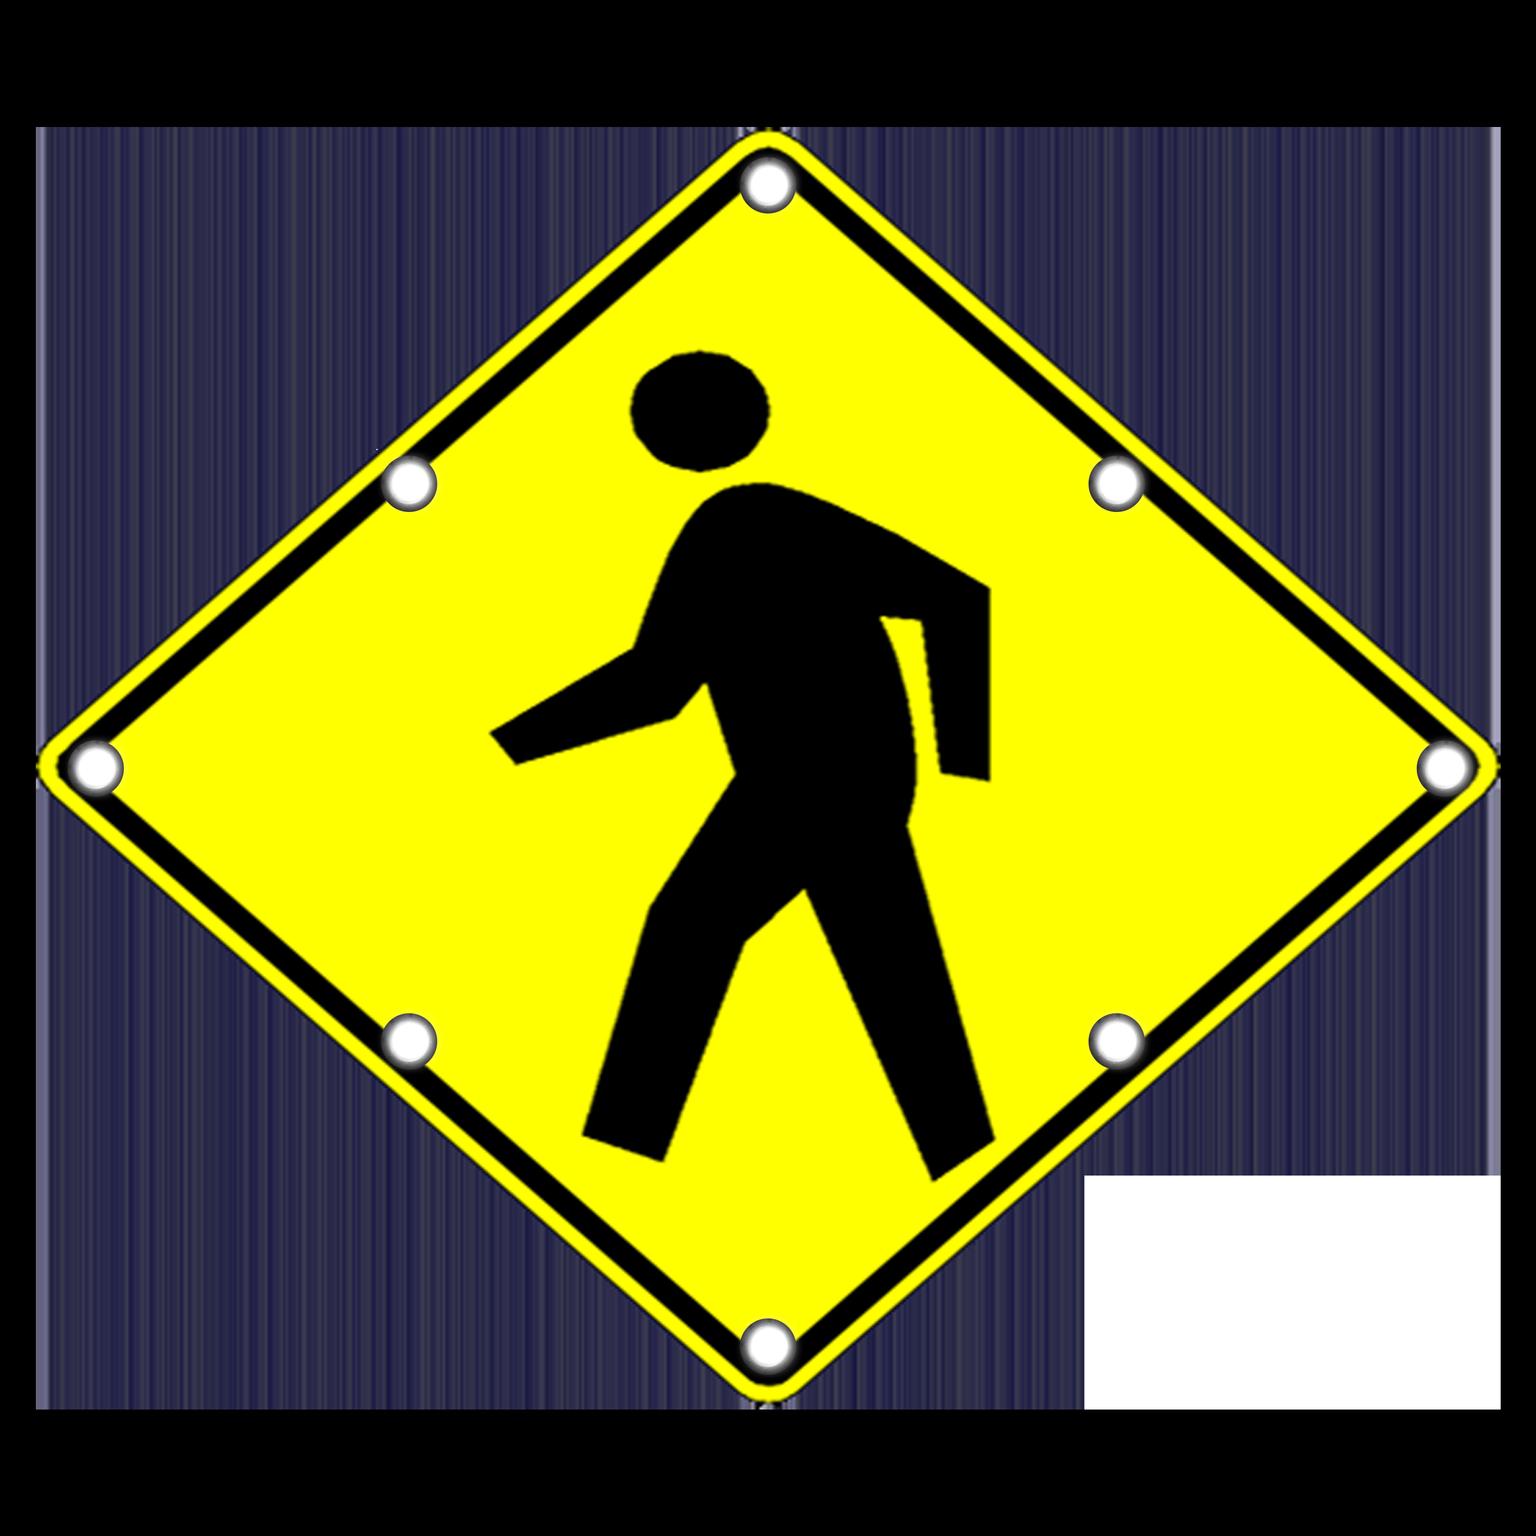 School zone sign clipart jpg transparent stock 30++ Great Road Sign Arrow jpg transparent stock